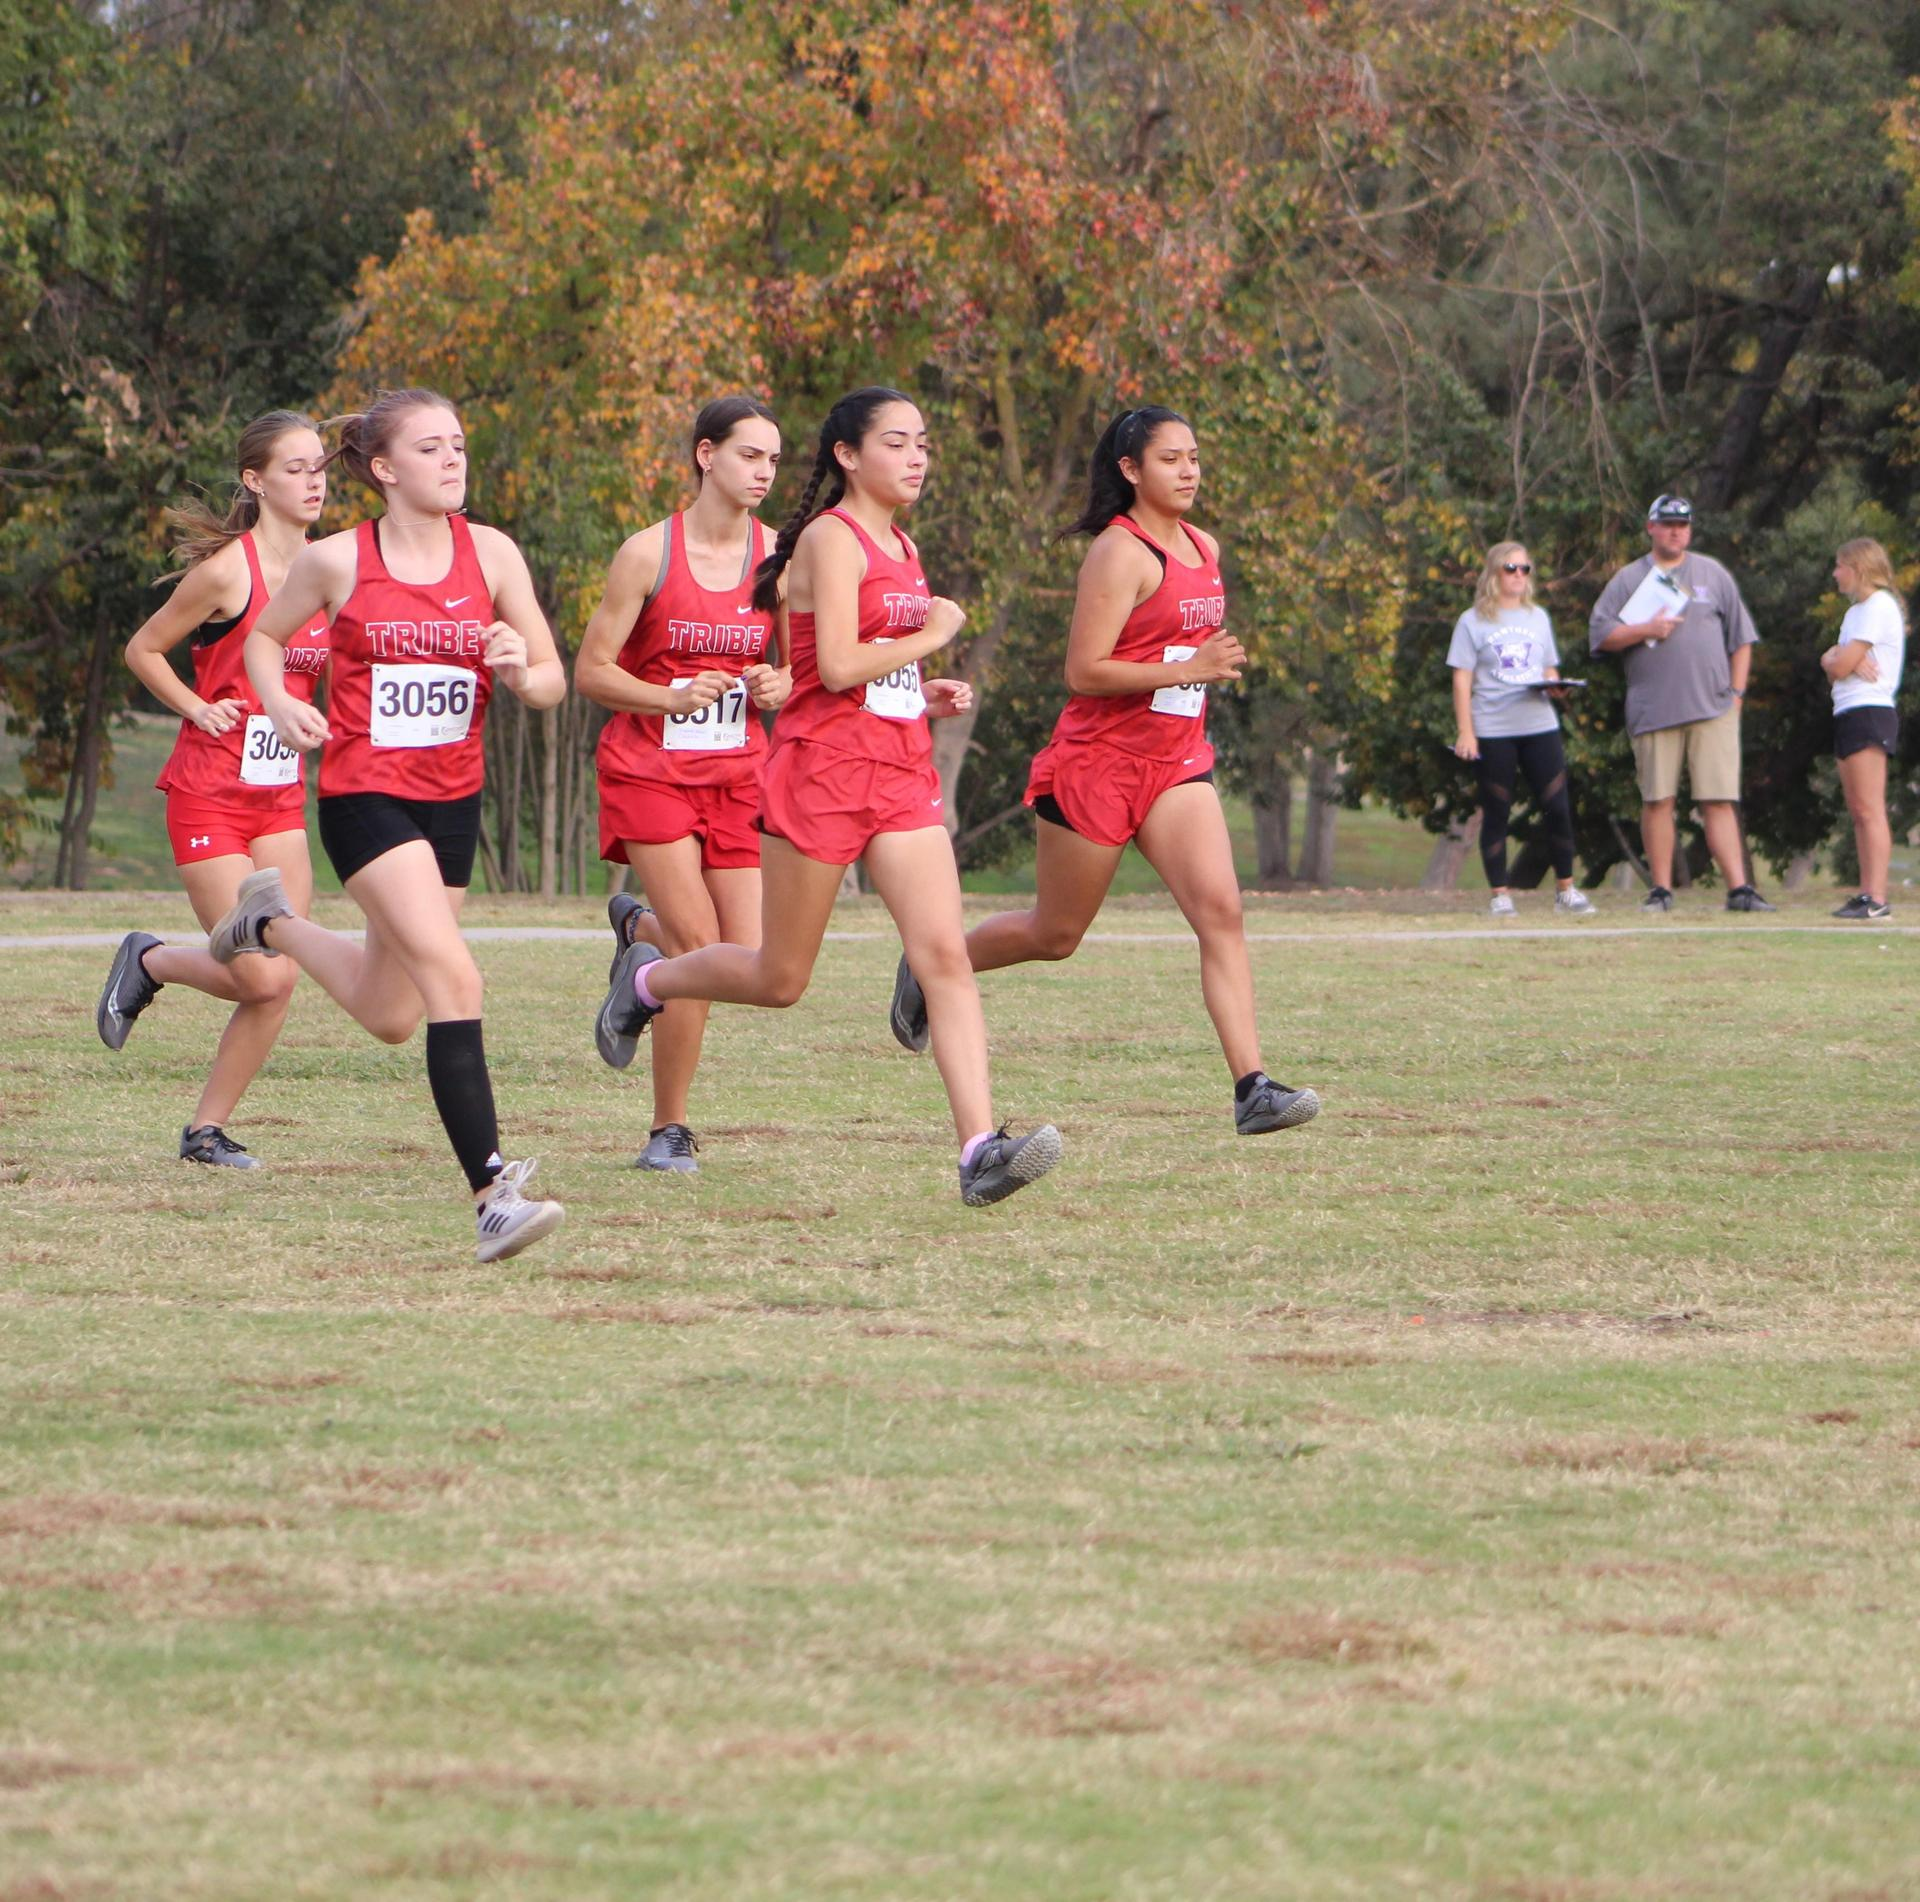 Girls starting the race